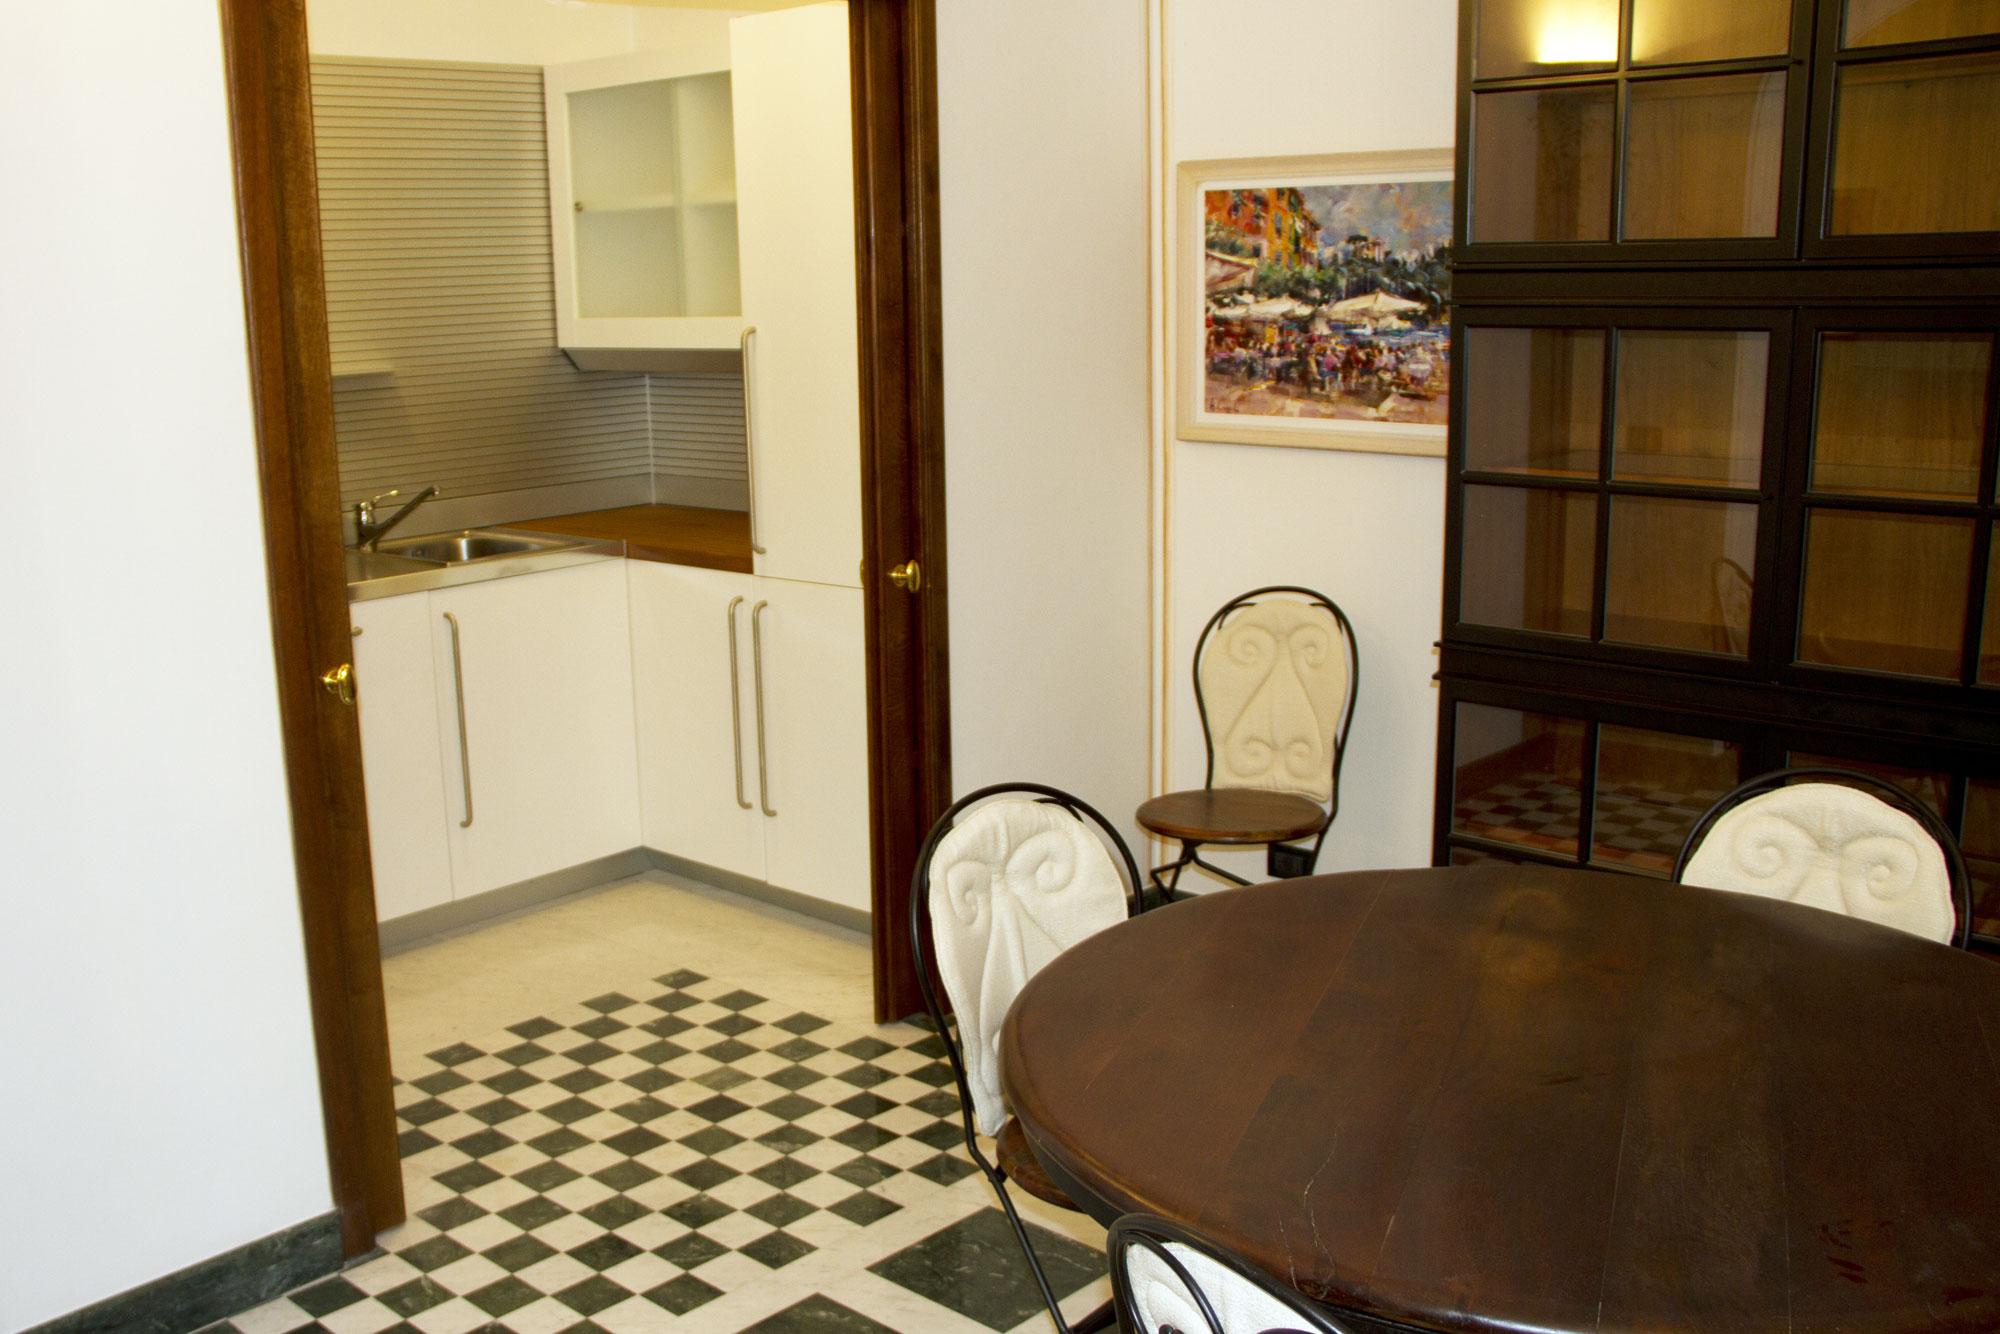 Interni-Cucina-Sala-Pranzo | Immobiliare Marrè